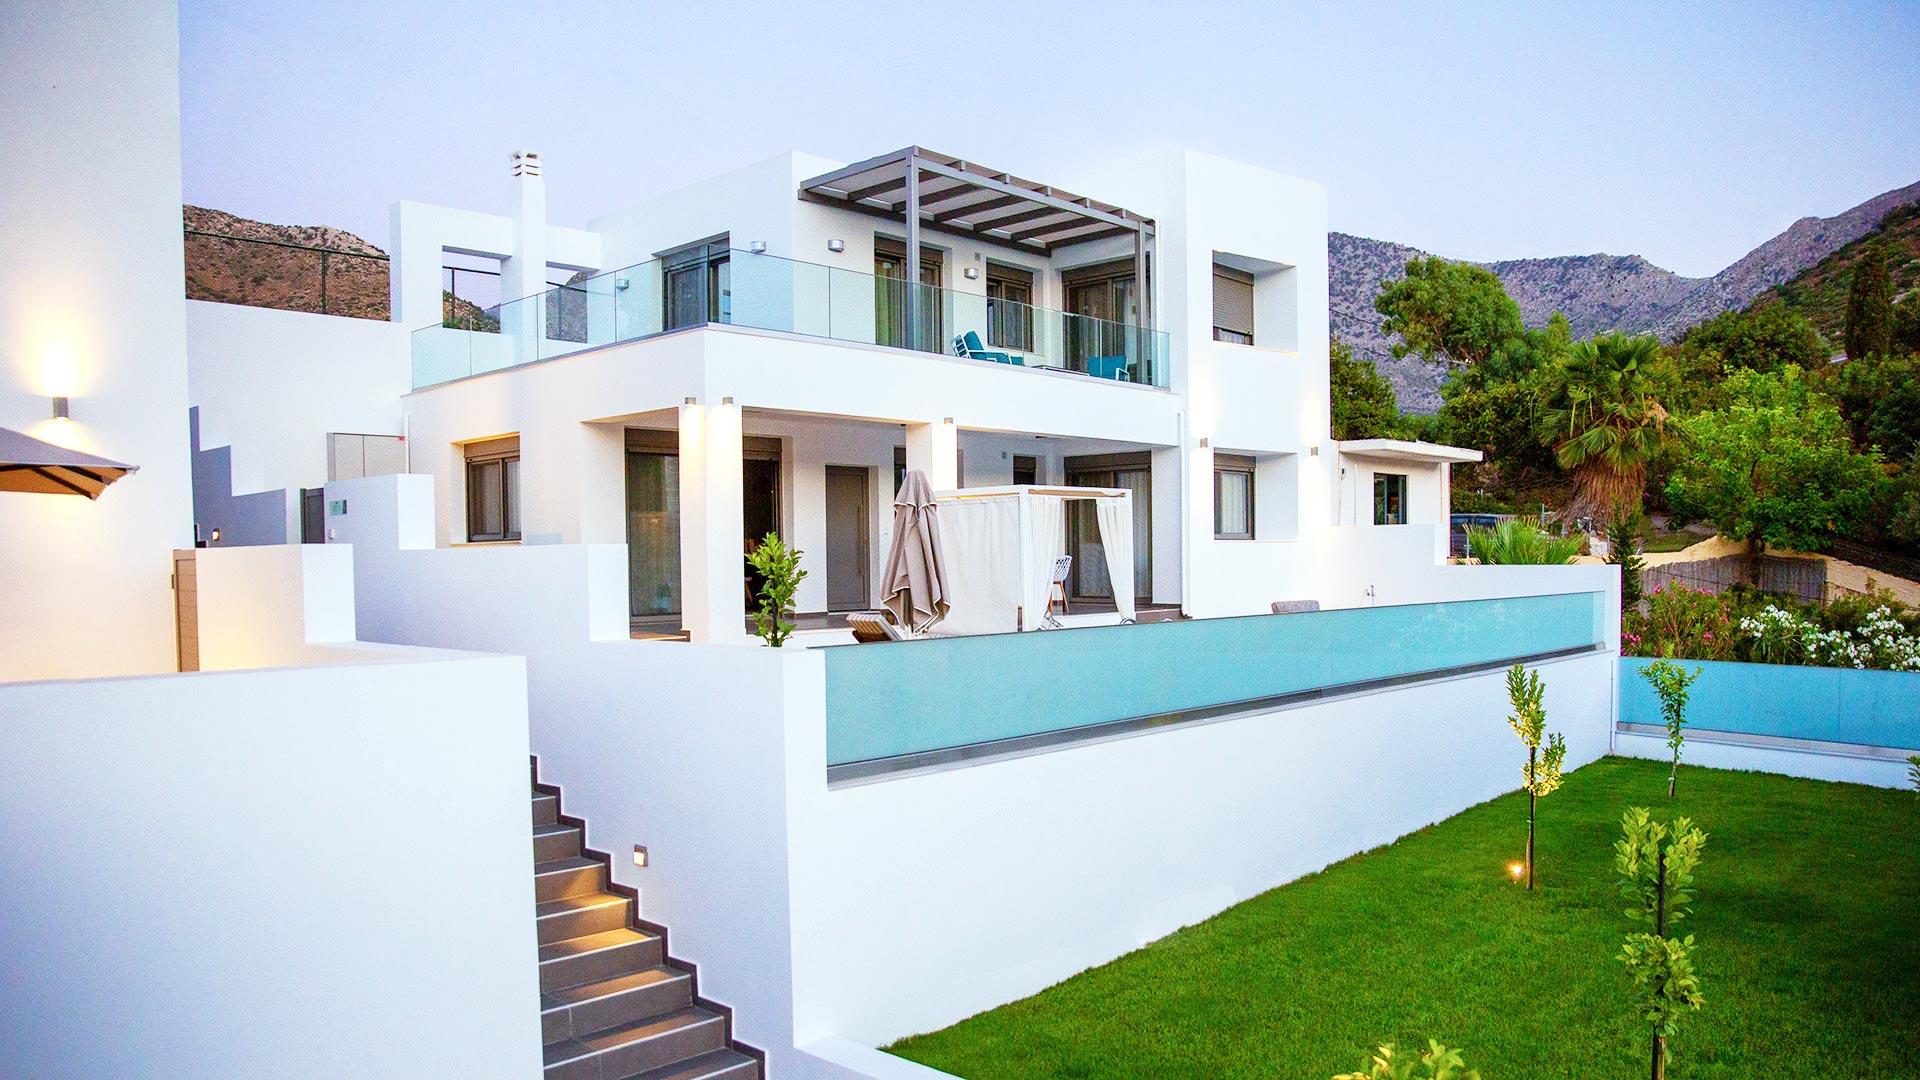 Adrianna Villas Villa Bali Villas Bali Crete Kreta Rethymno Apartment Apartments House Residence Hotel Boutique Luxury Crete Kreta Greece